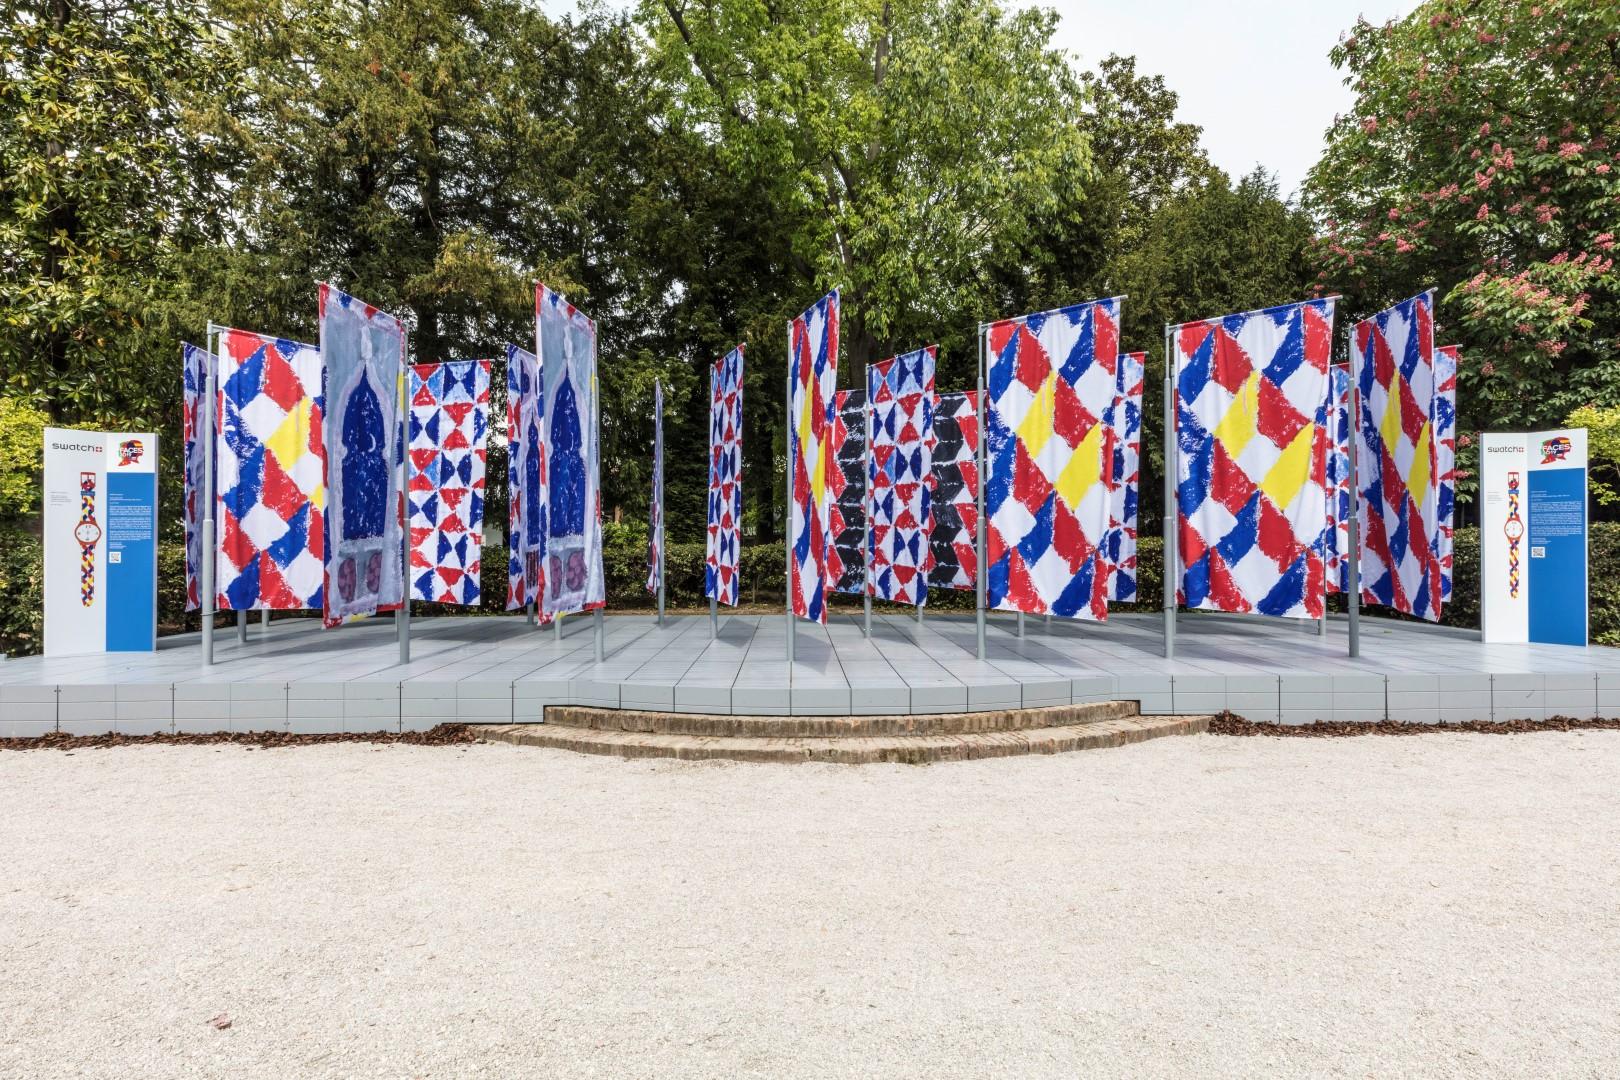 Biennale Arte Venezia 2019 Swatch